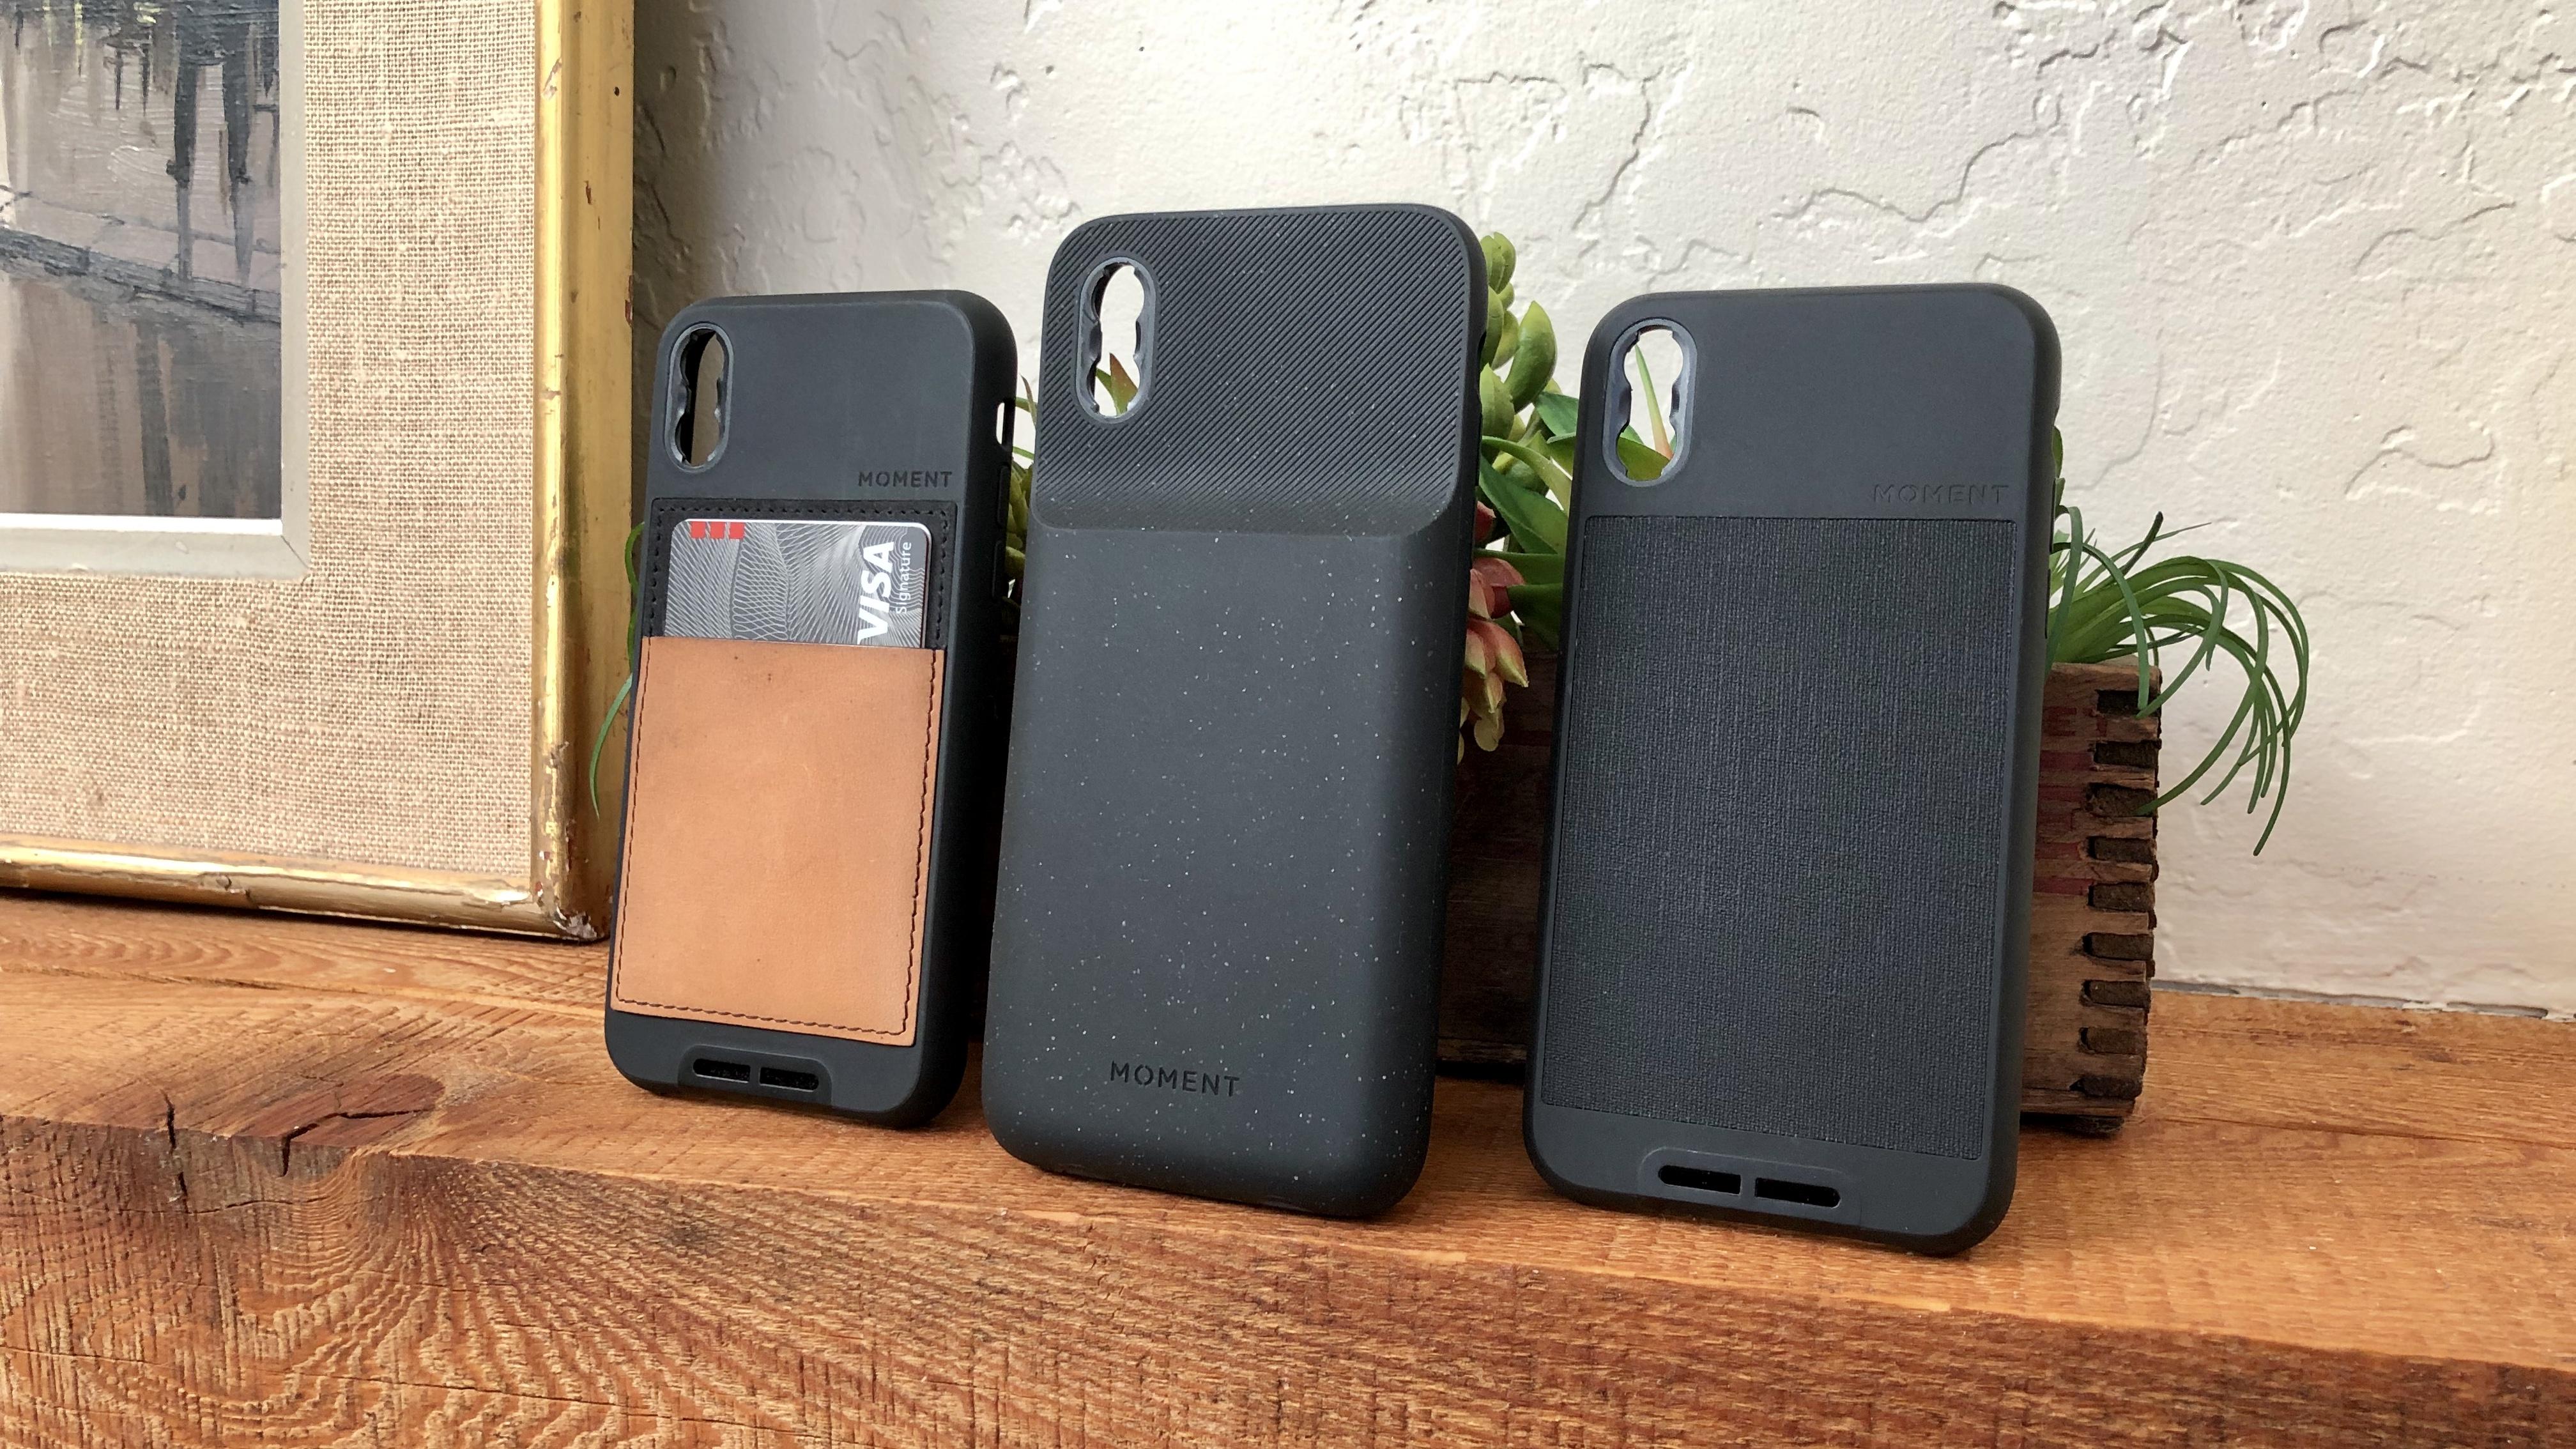 Moment battery case lenses iPhone